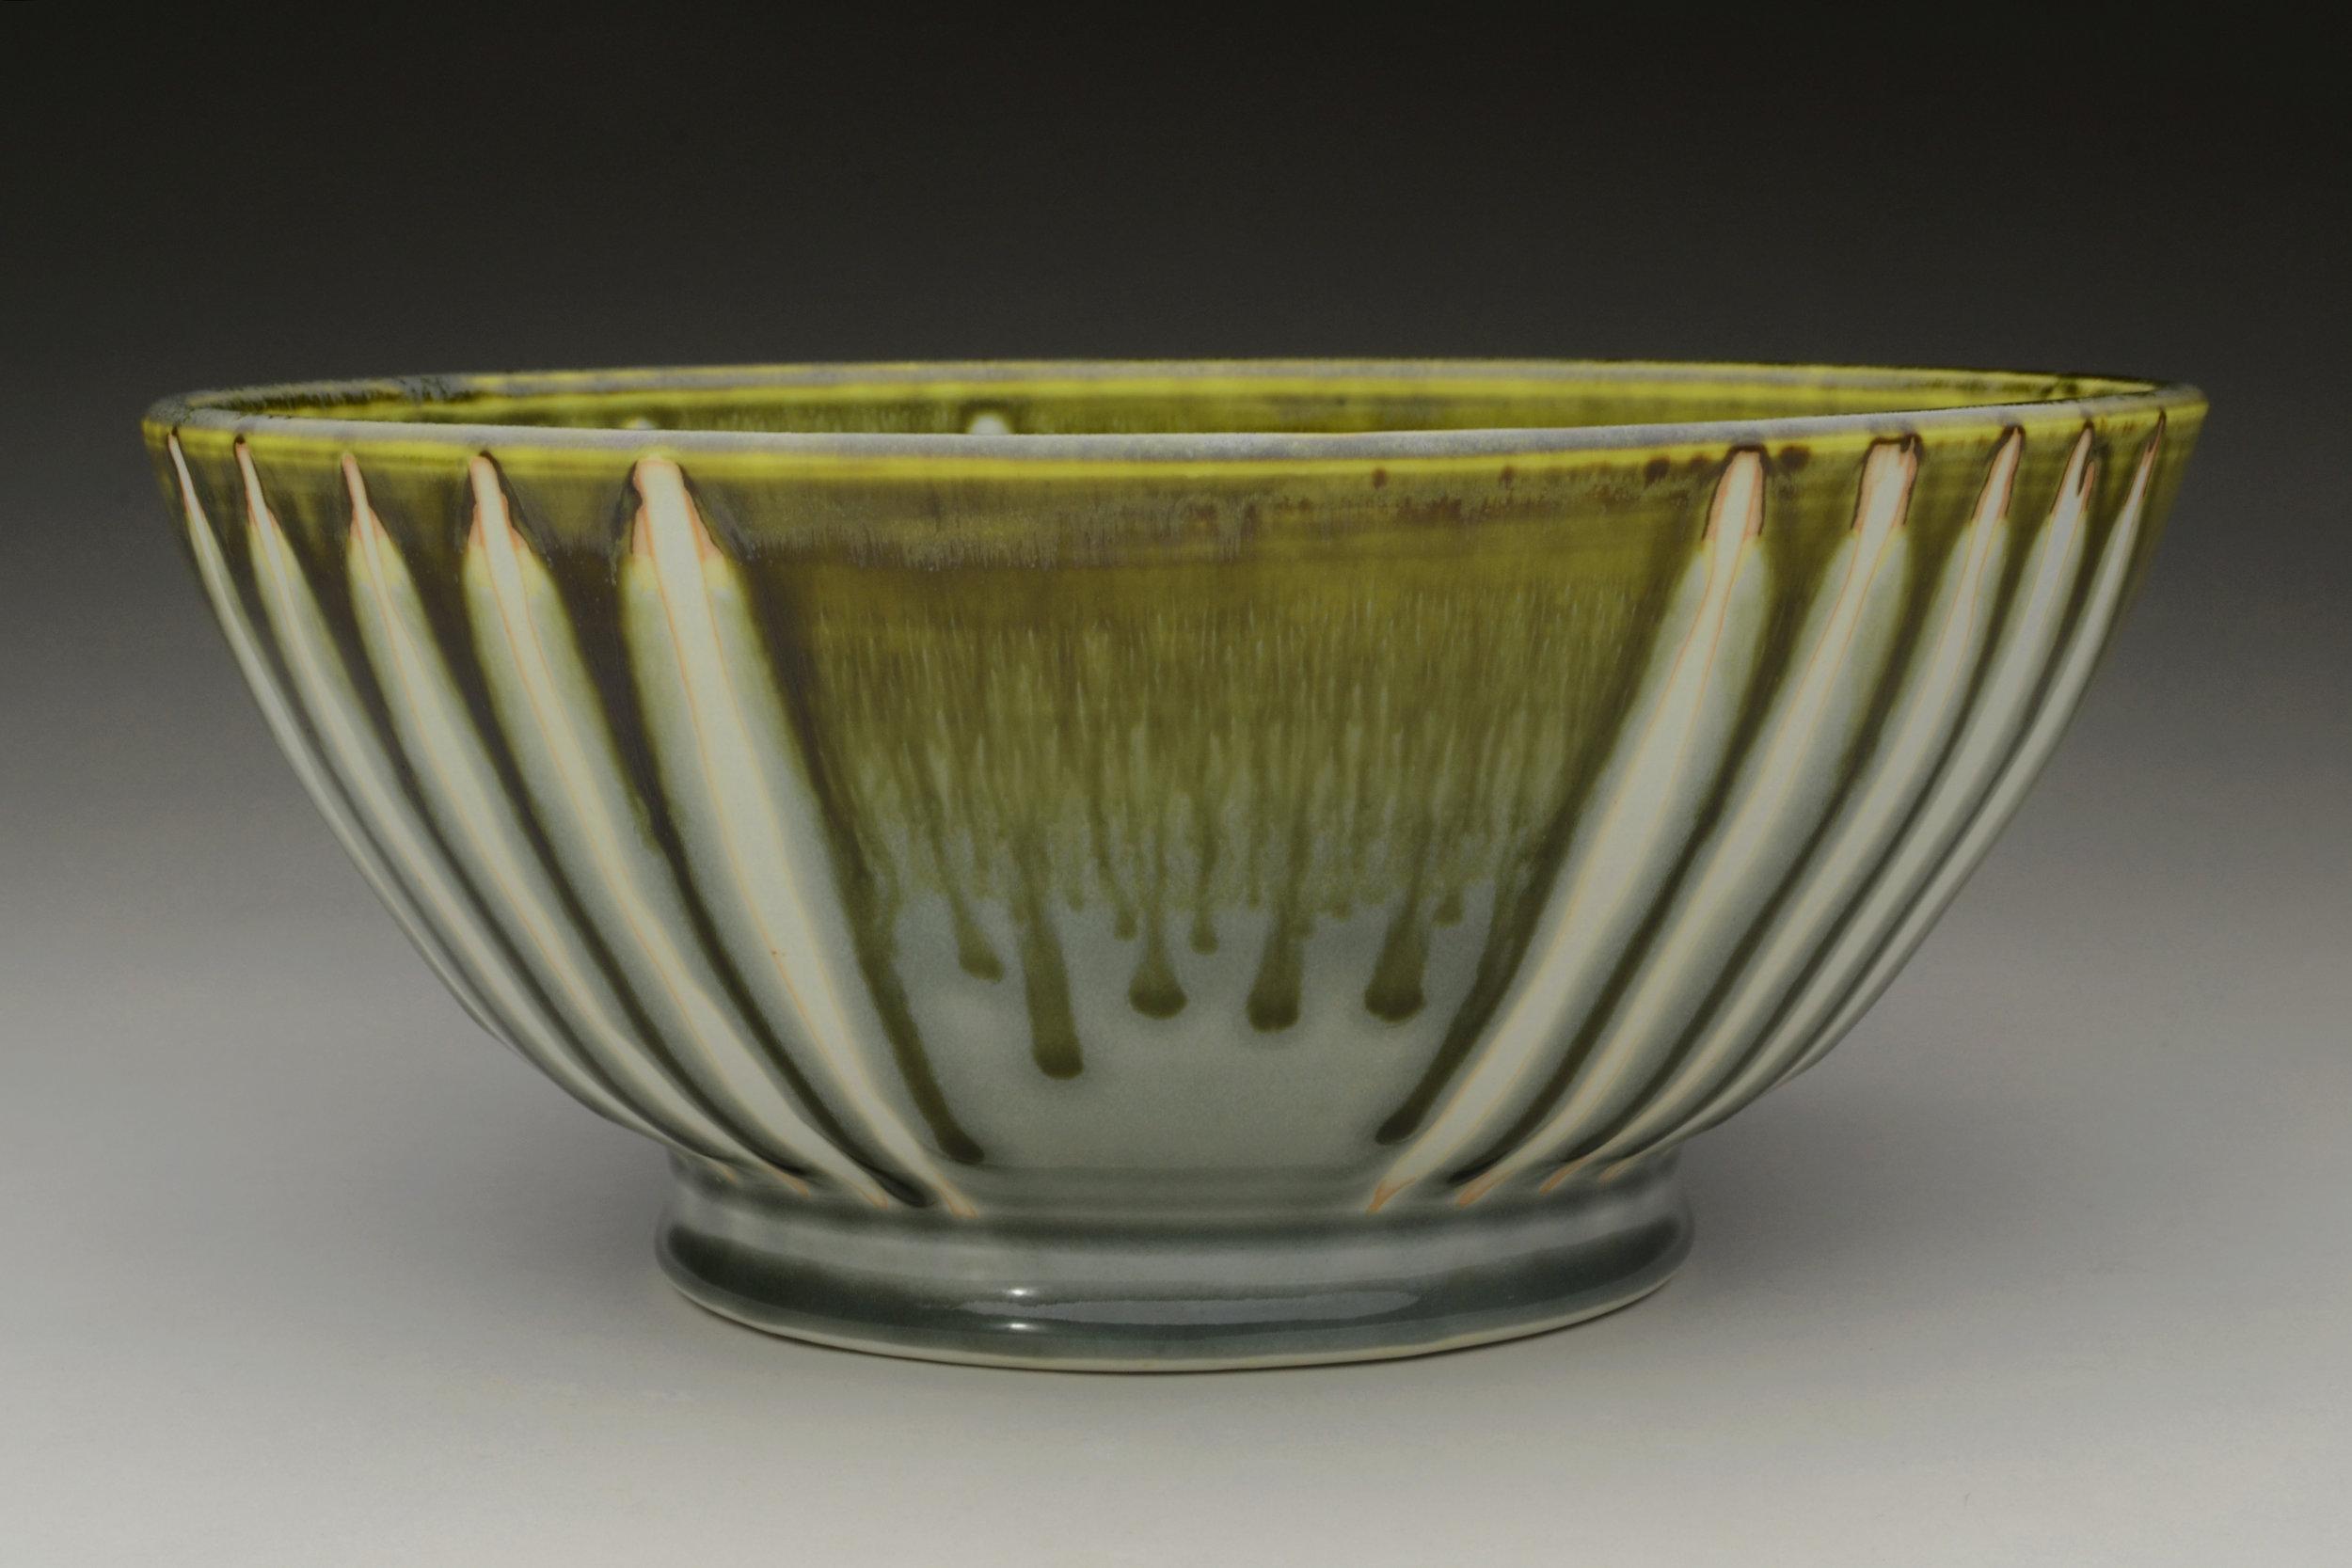 hk-bowl-1.jpg